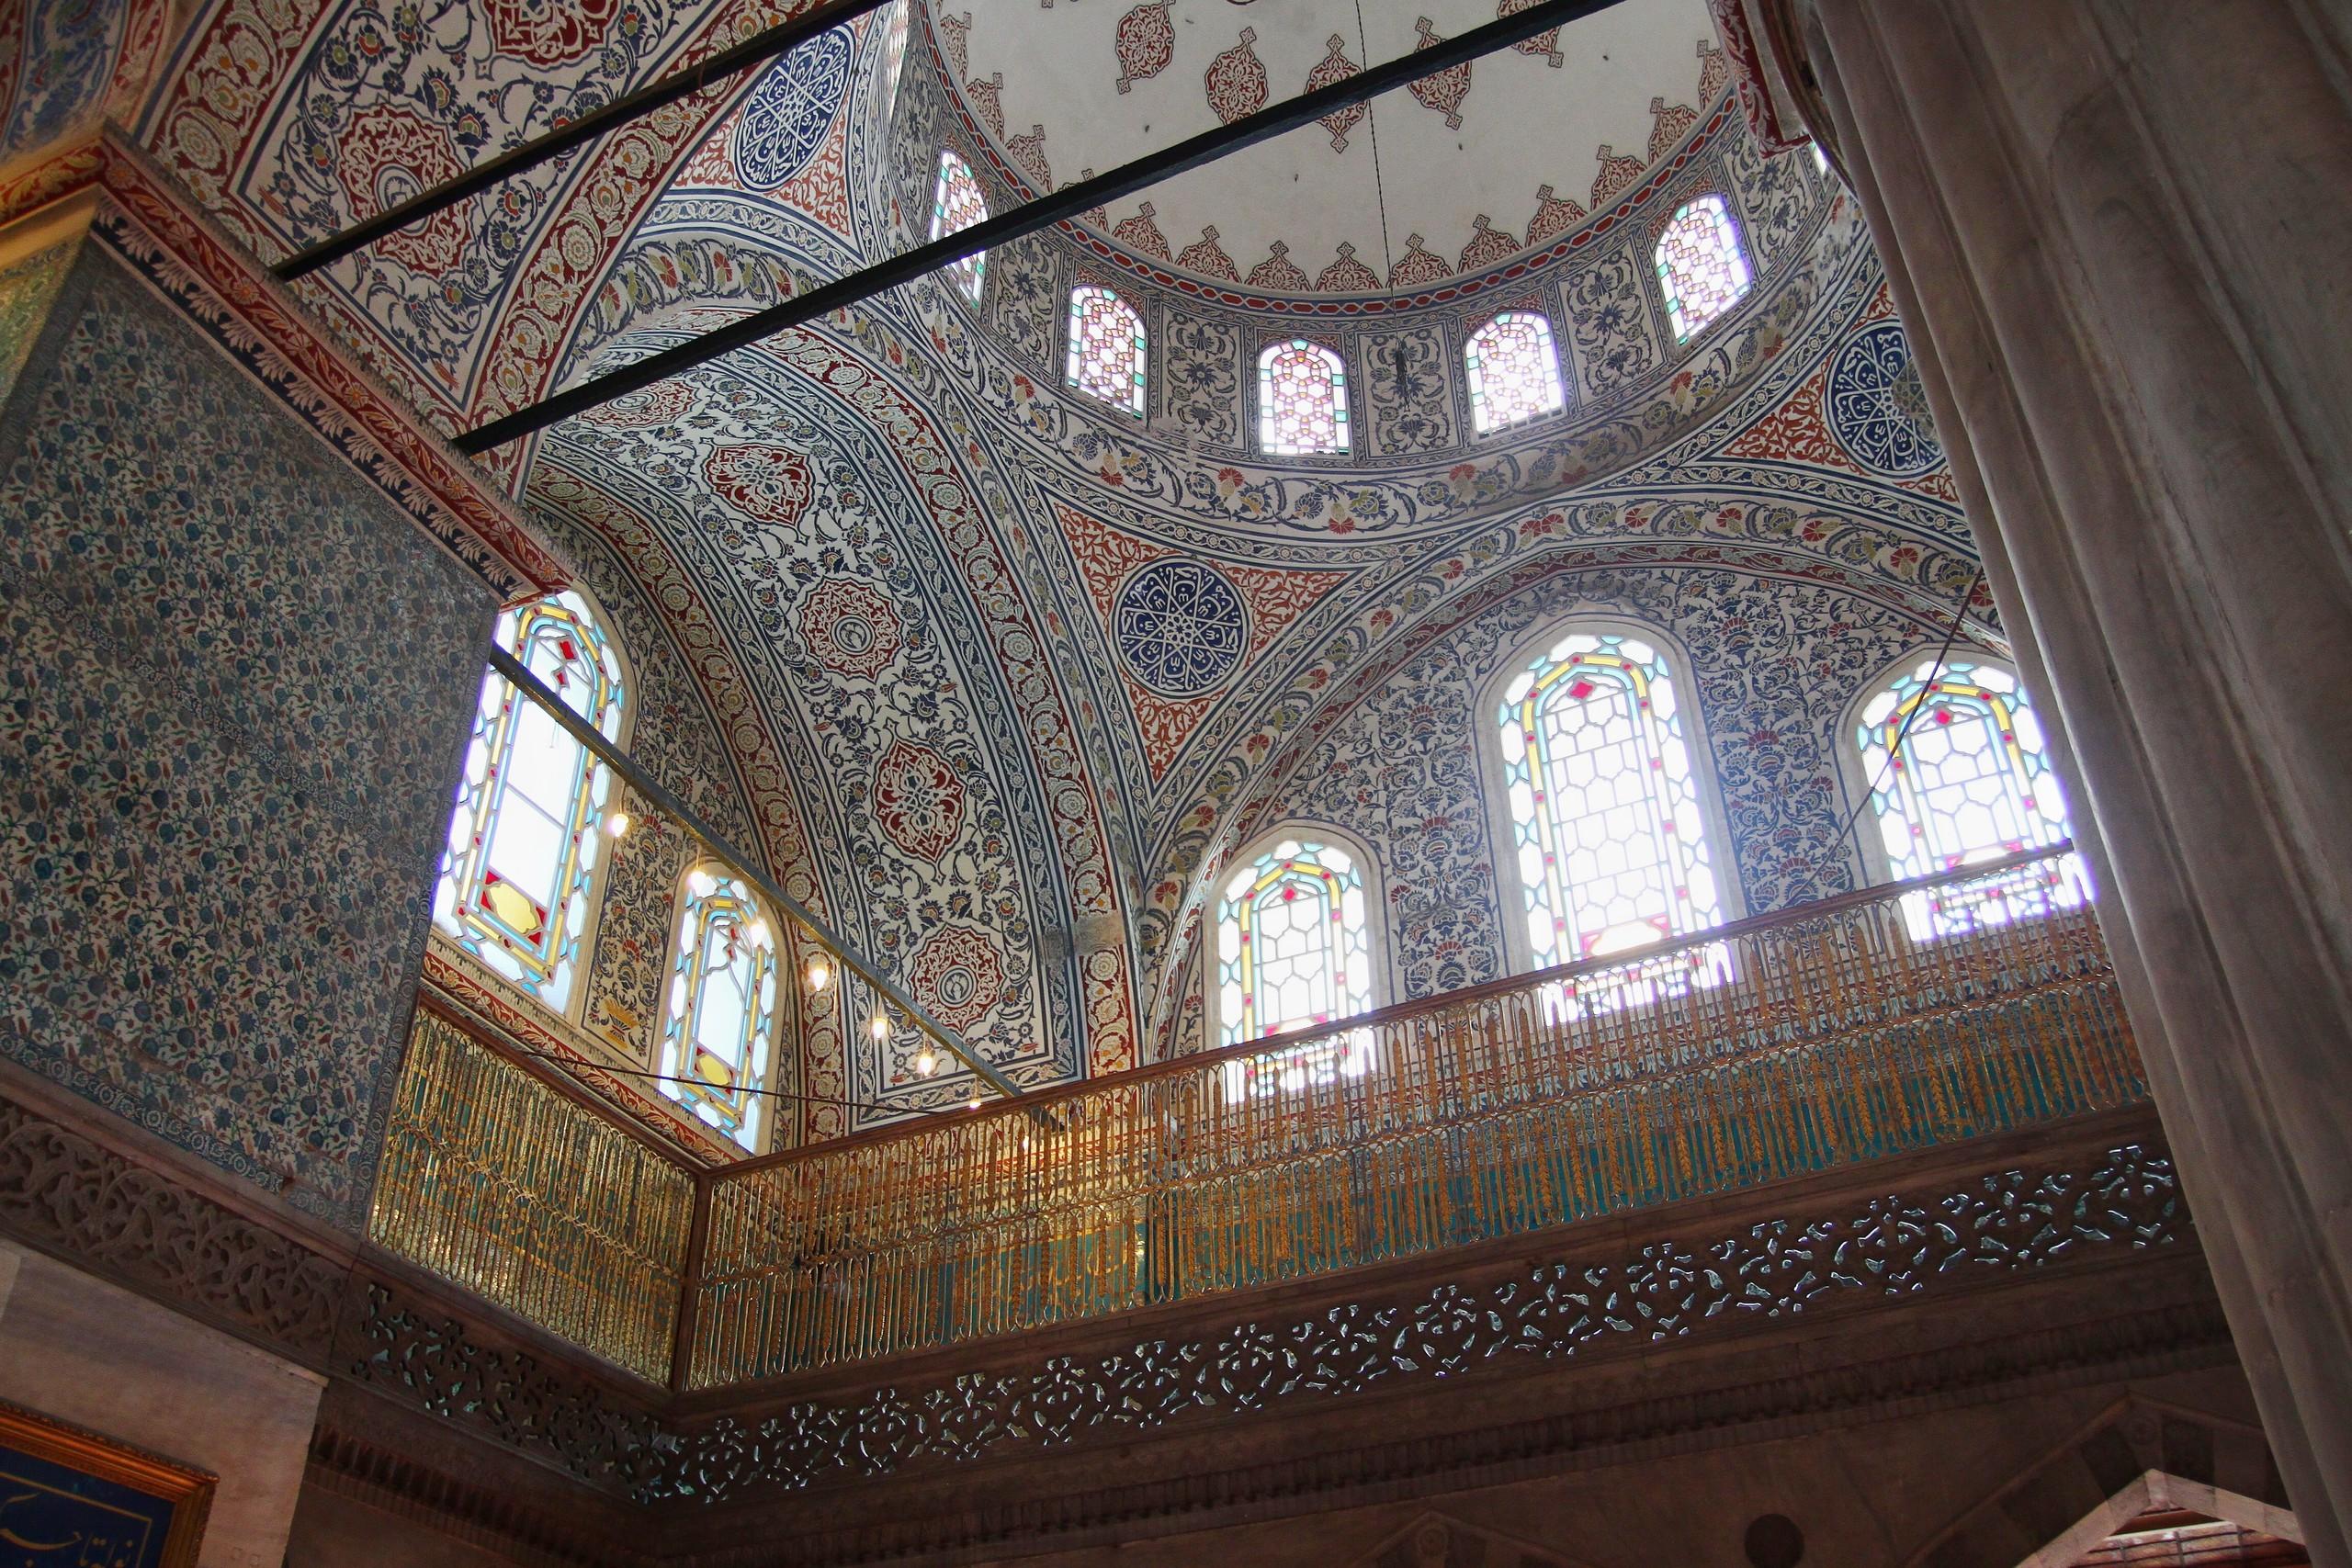 Pırlantadan Kubbeler #5: Sultanahmed - GzWMyr - Pırlantadan Kubbeler #5: Sultanahmed